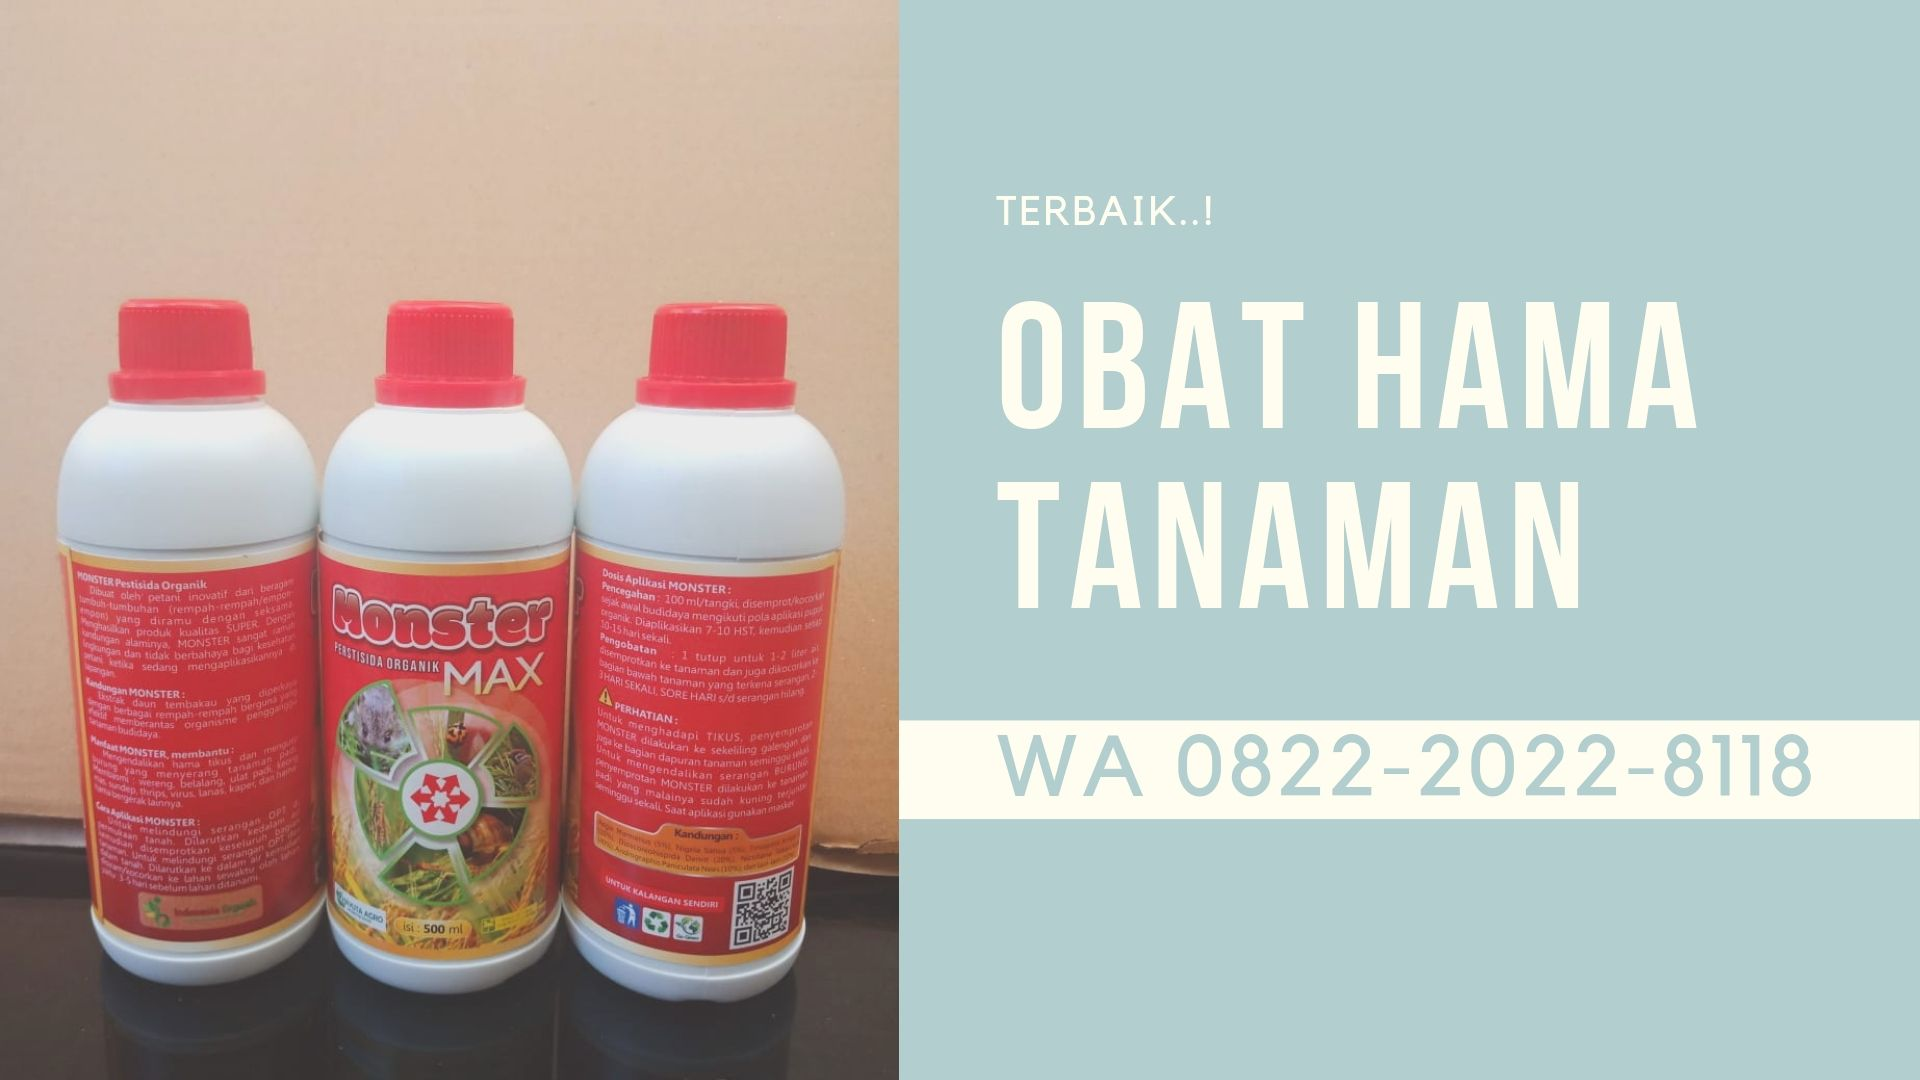 Alami Hp Wa 082 220 228 118 Amanah Obat Hama Wereng Yang Ampuh Di Yogyakarta Nyamuk Wereng Tanaman